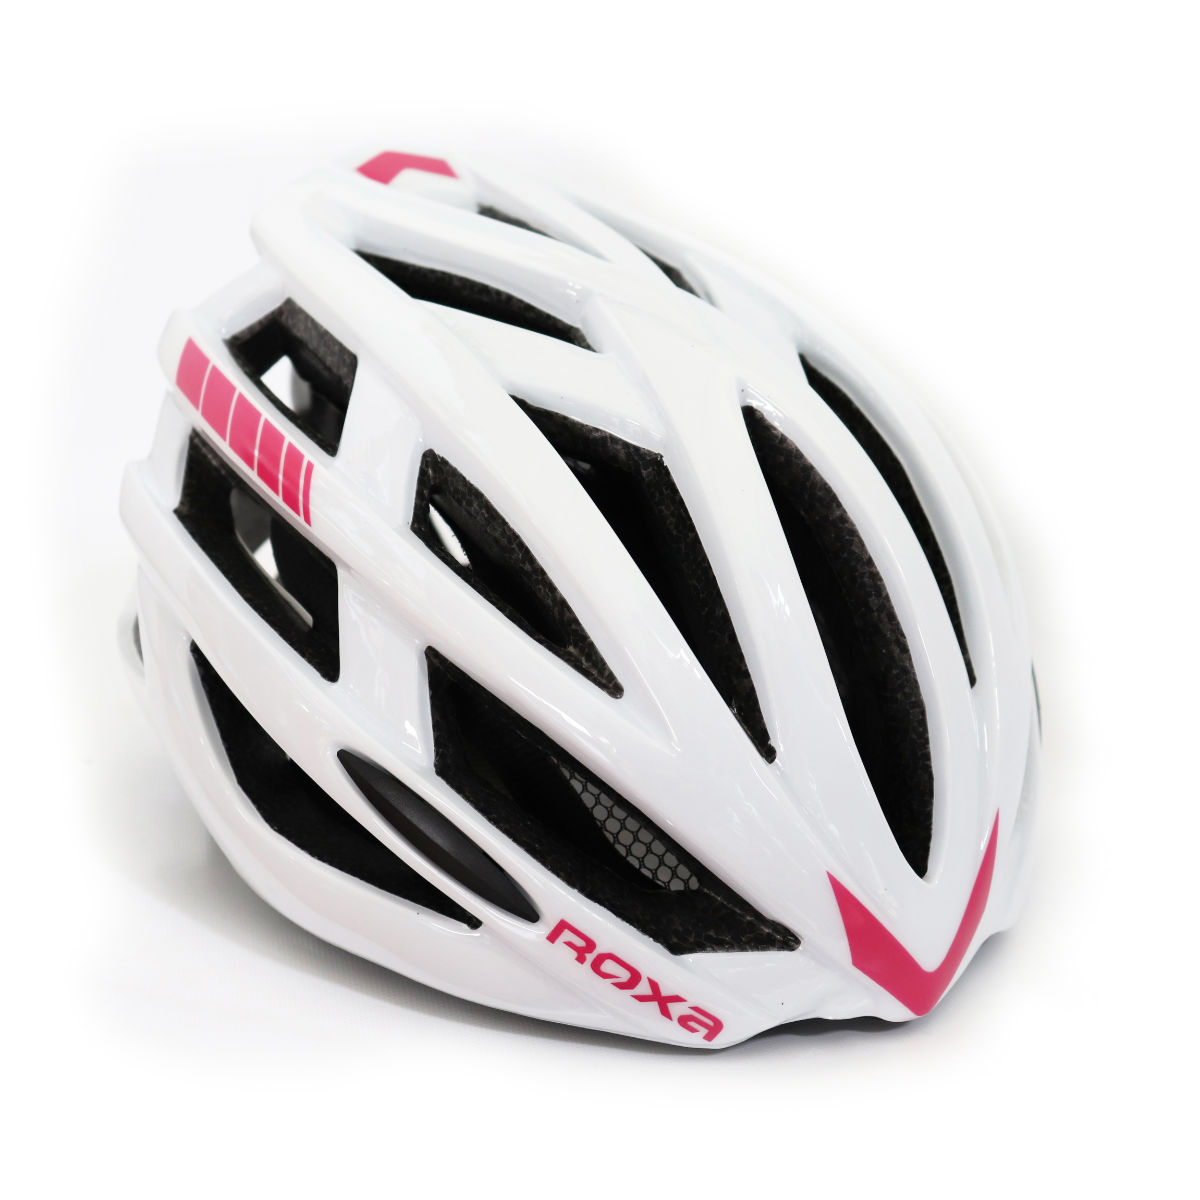 casco pattinaggio regolabile bianco rosa retro - roxa